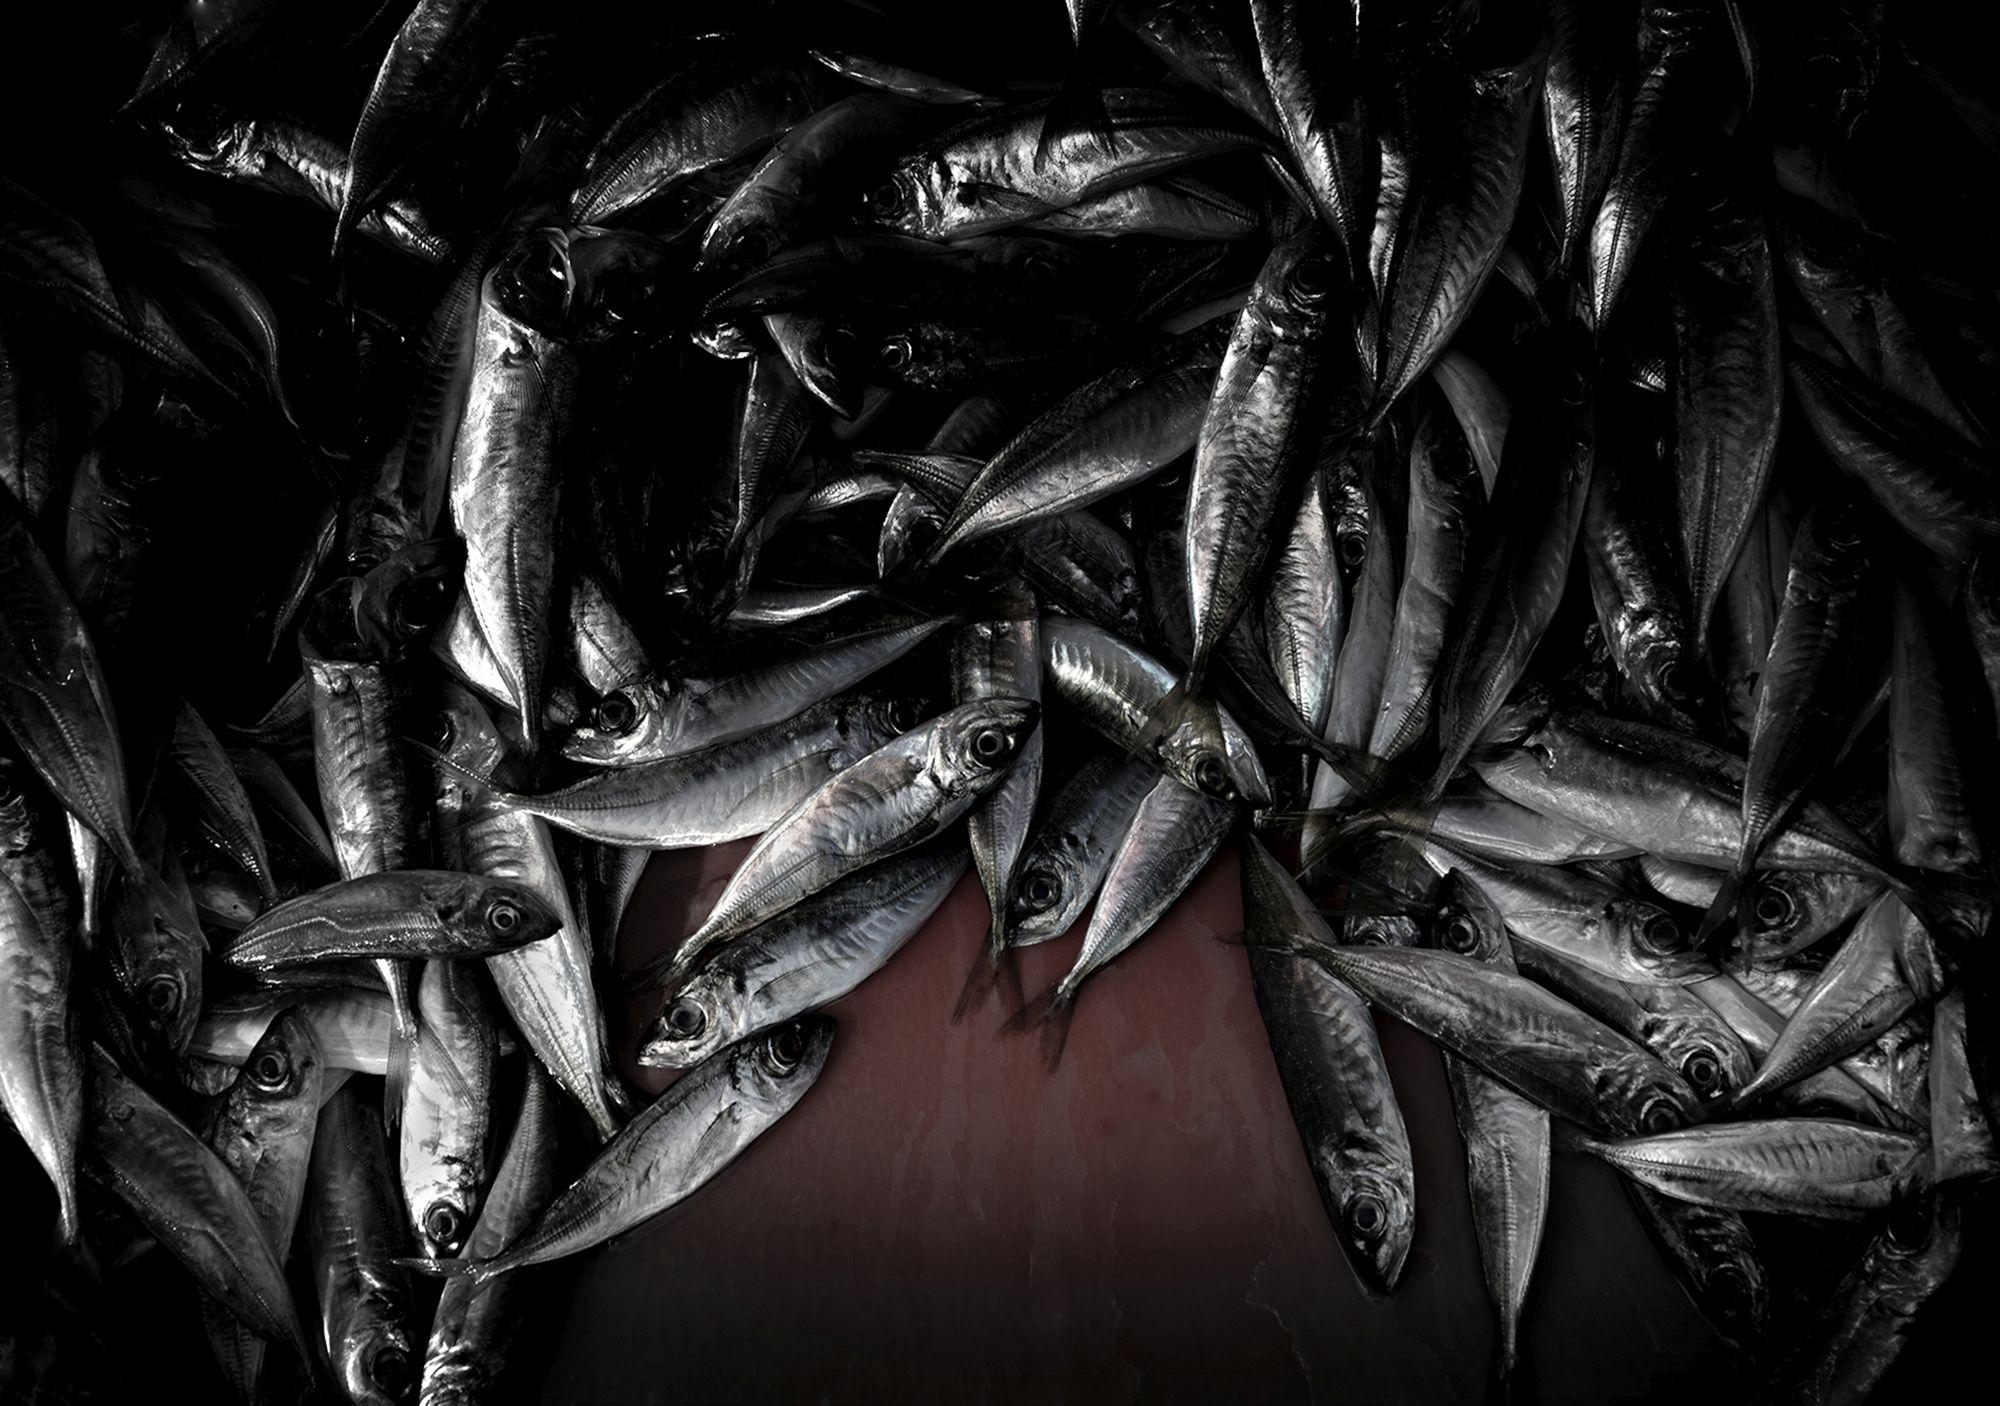 Cose di nature, Nature's Matters #5, Pesci/Fish, 2014